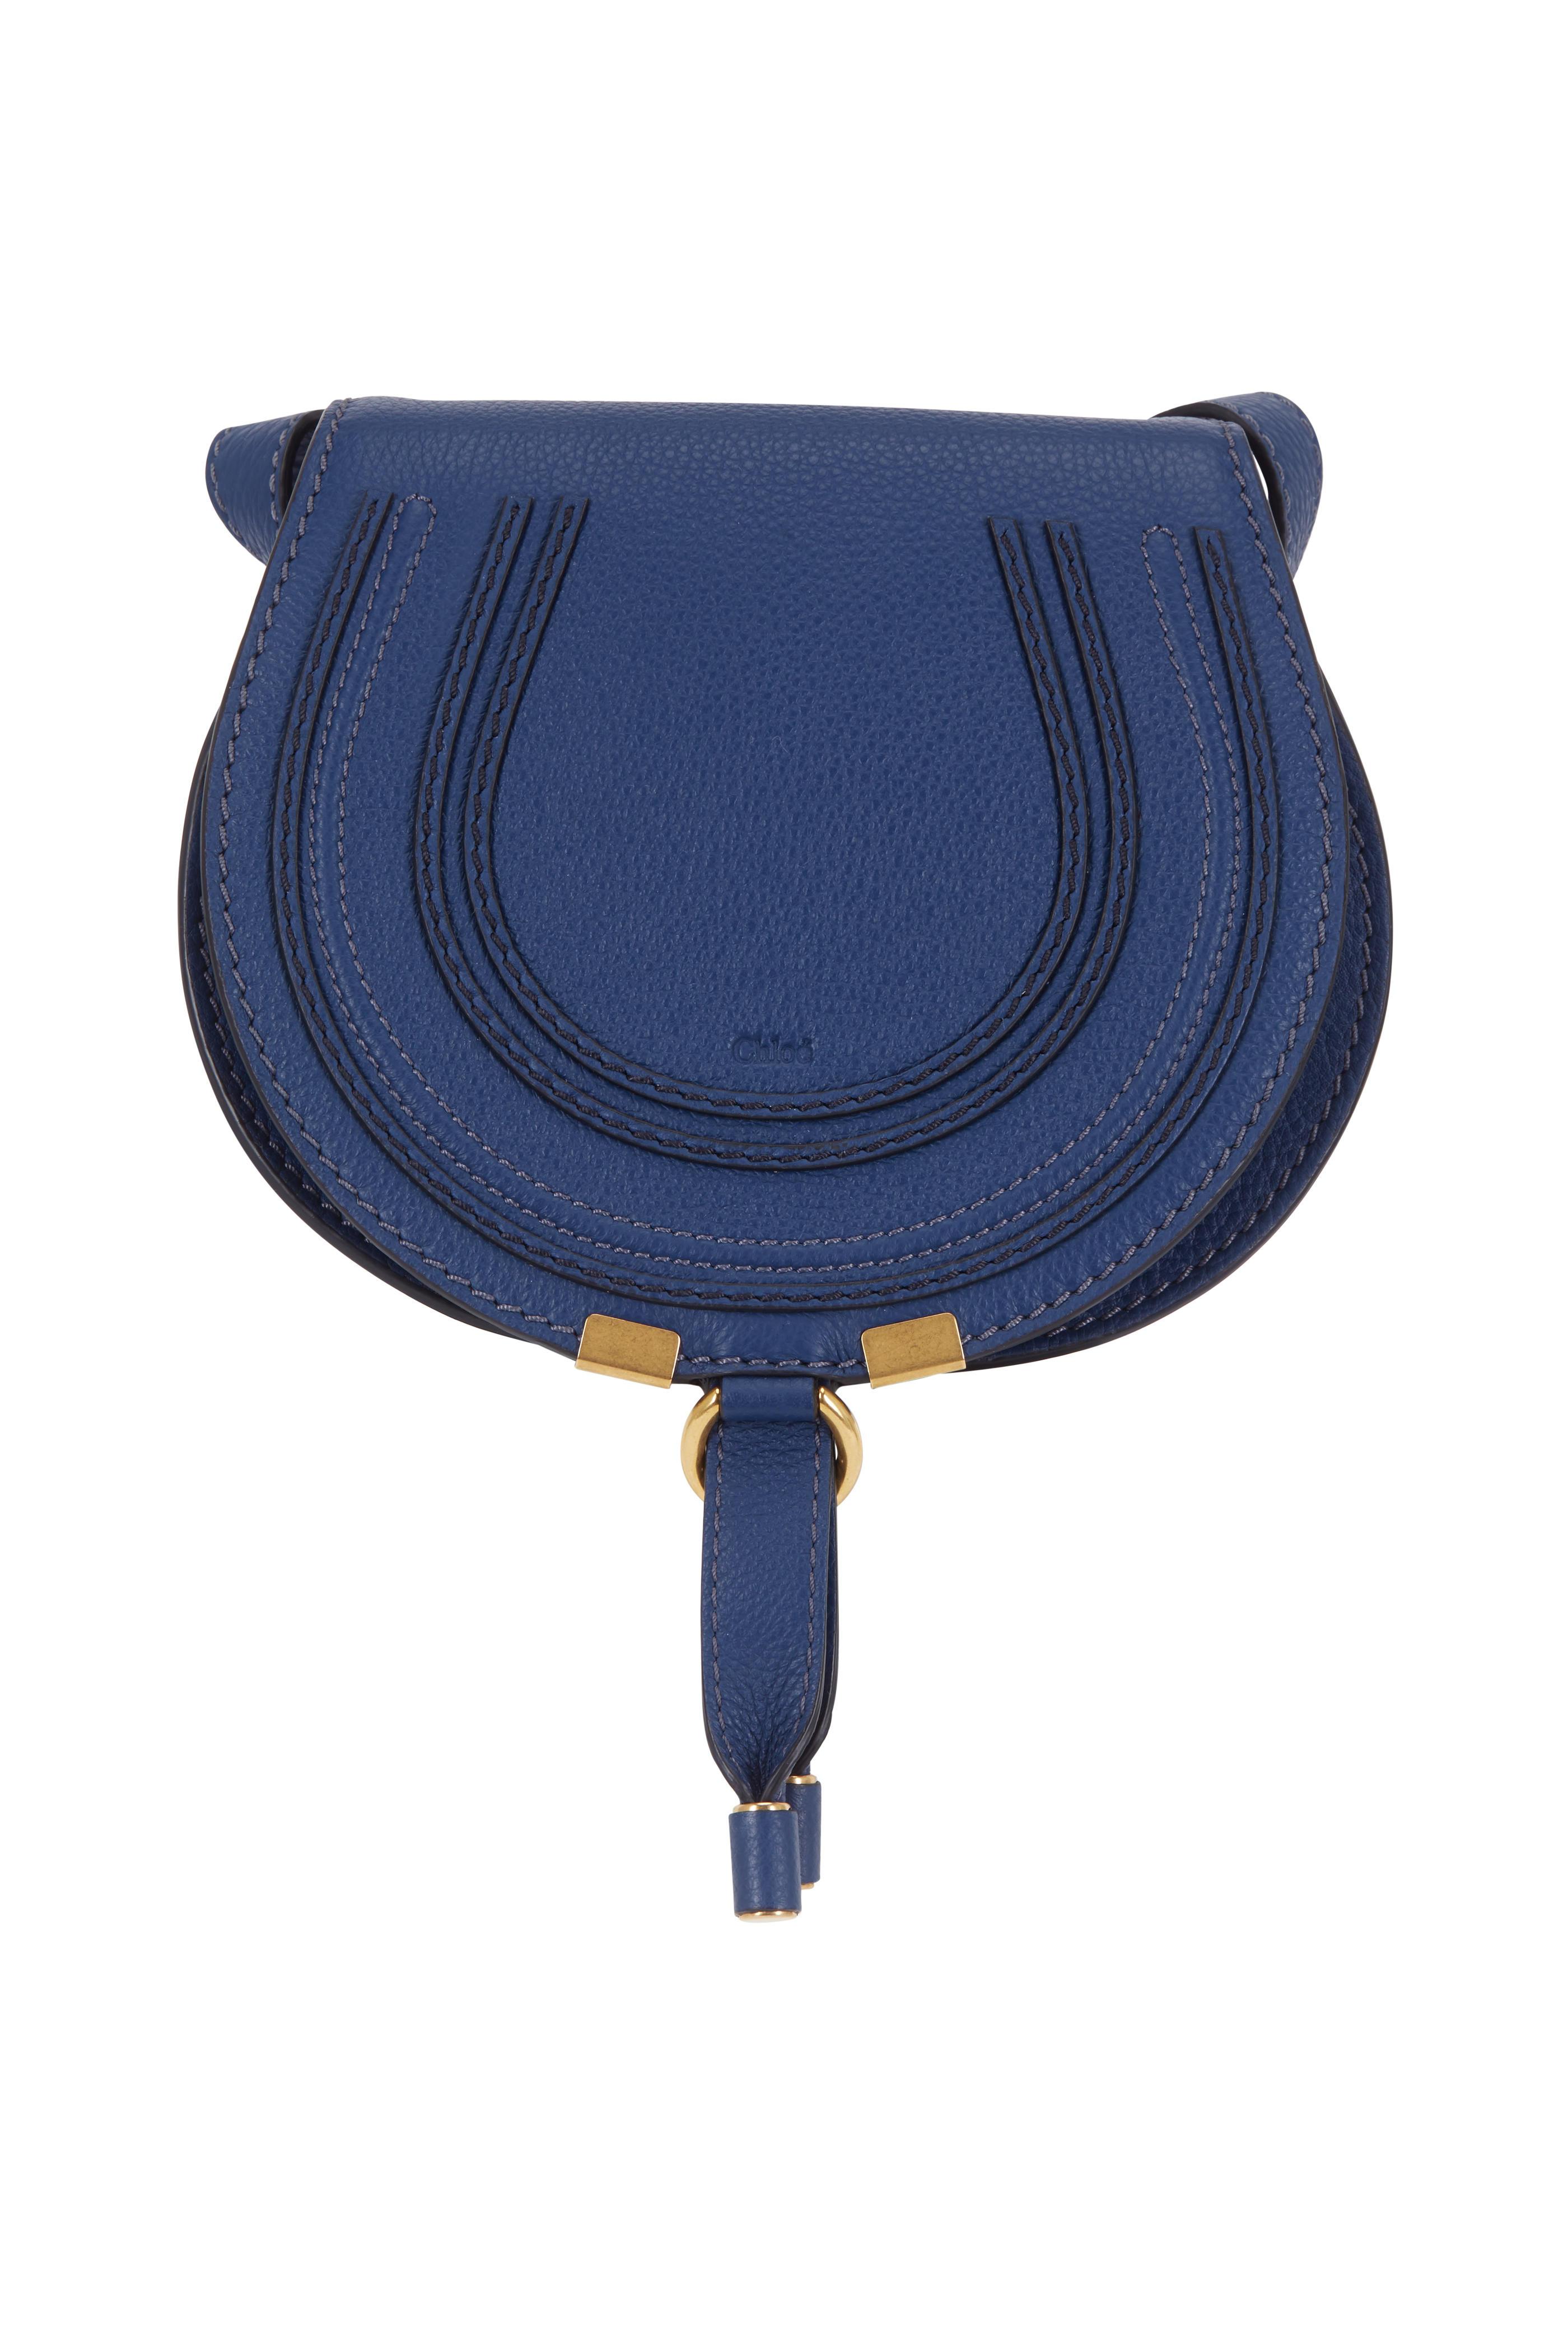 3fa54321b86 Chloé - Marcie Navy Blue Leather Small Crossbody | Mitchell Stores